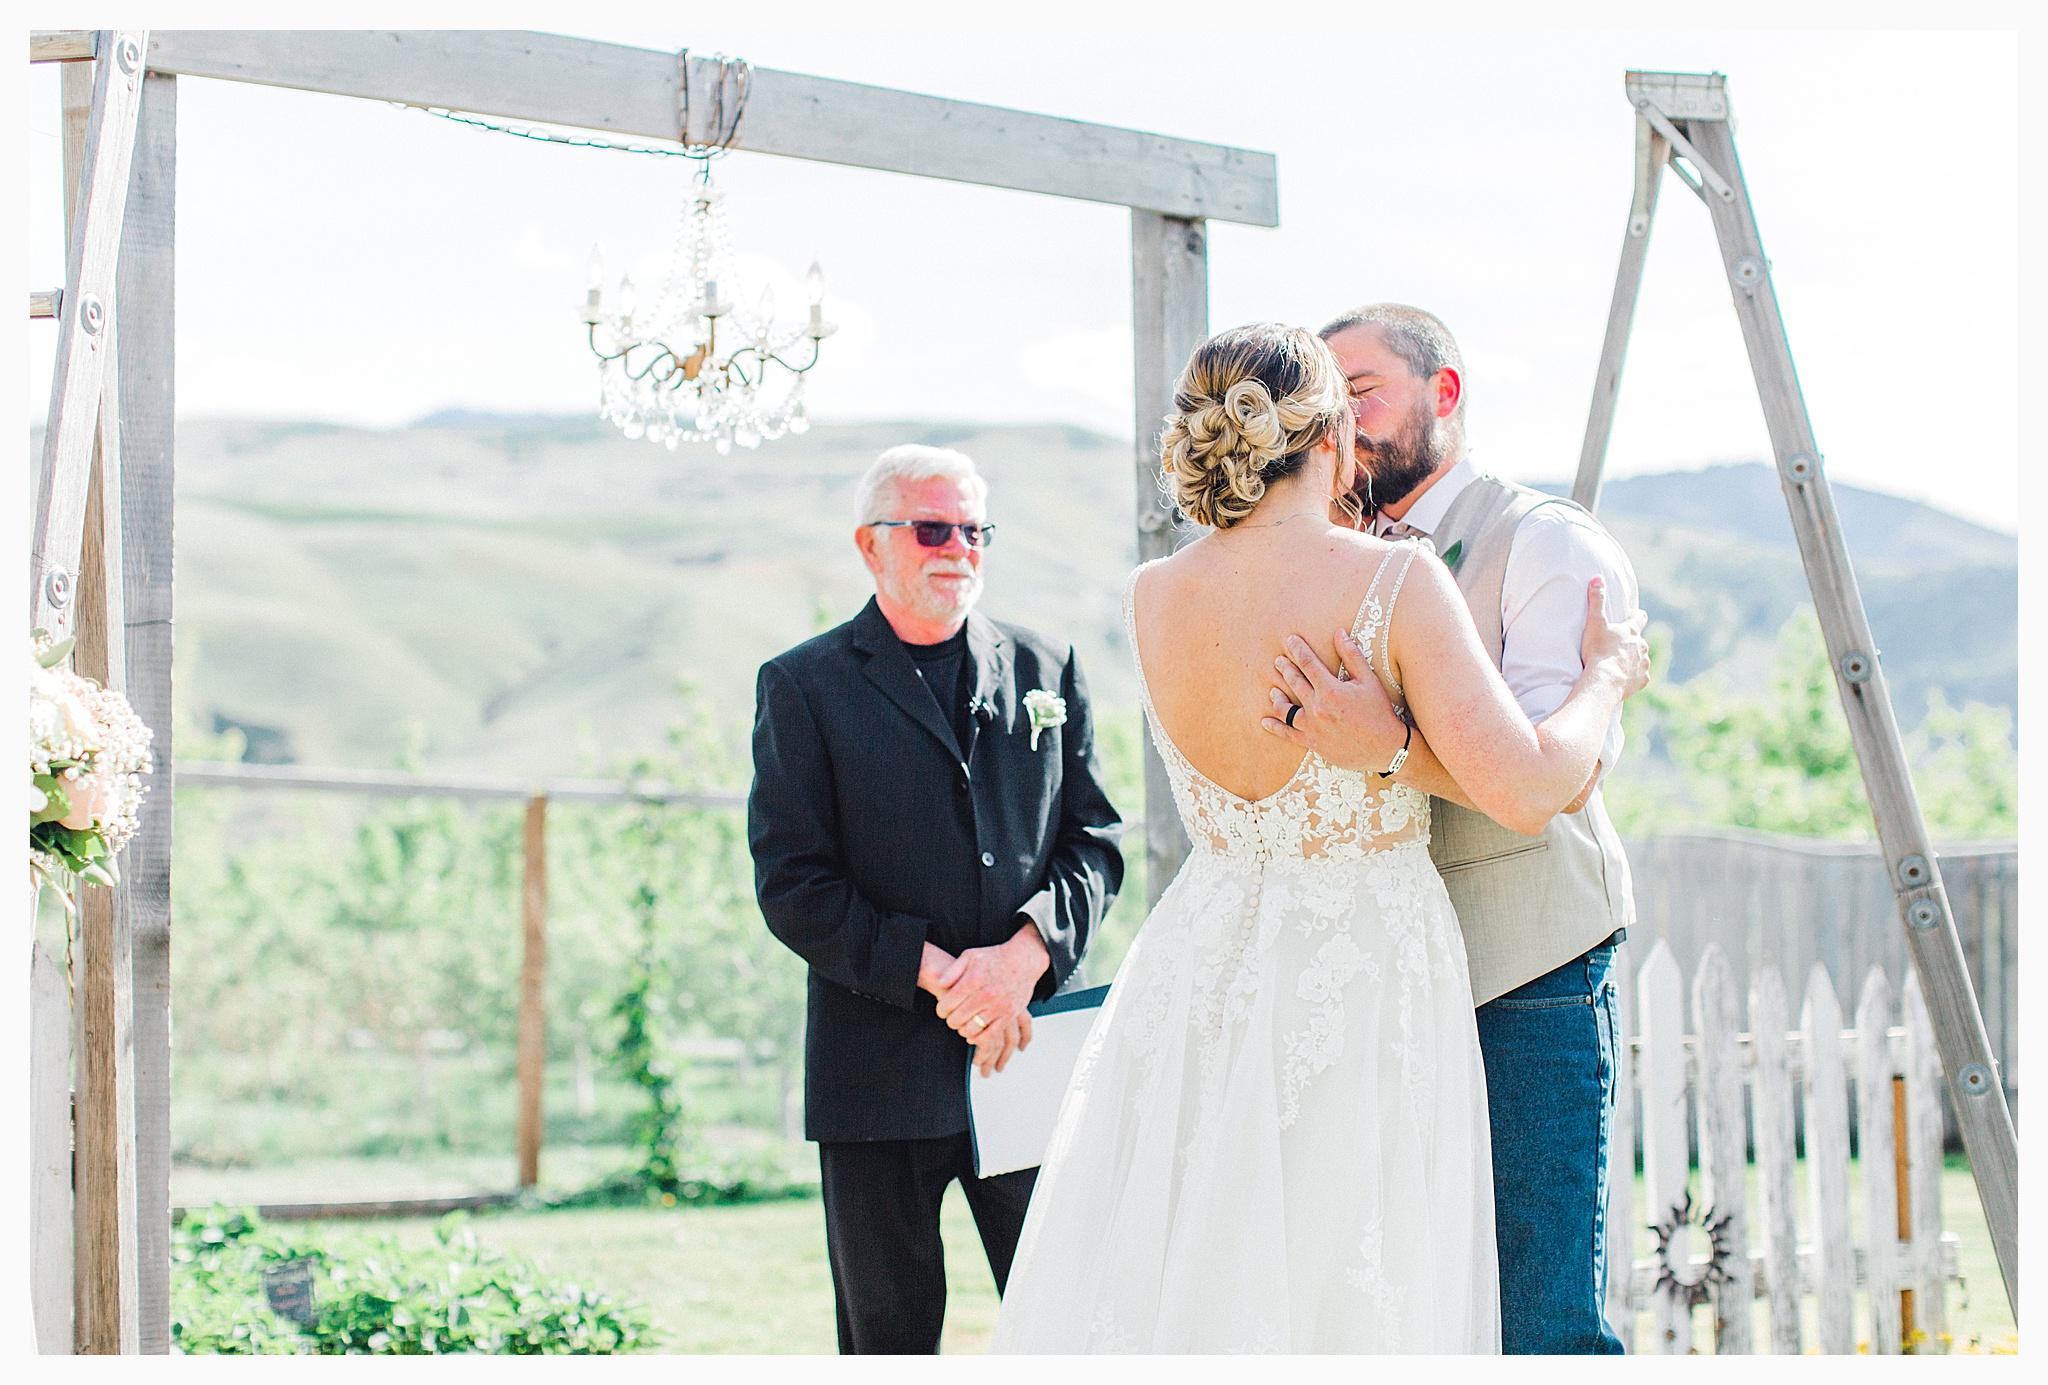 Rustic barn wedding in Wenatchee Washington at Sunshine Ranch on Easy Street, Emma Rose Company Seattle PNW Light and Airy Wedding Photographer_0070.jpg